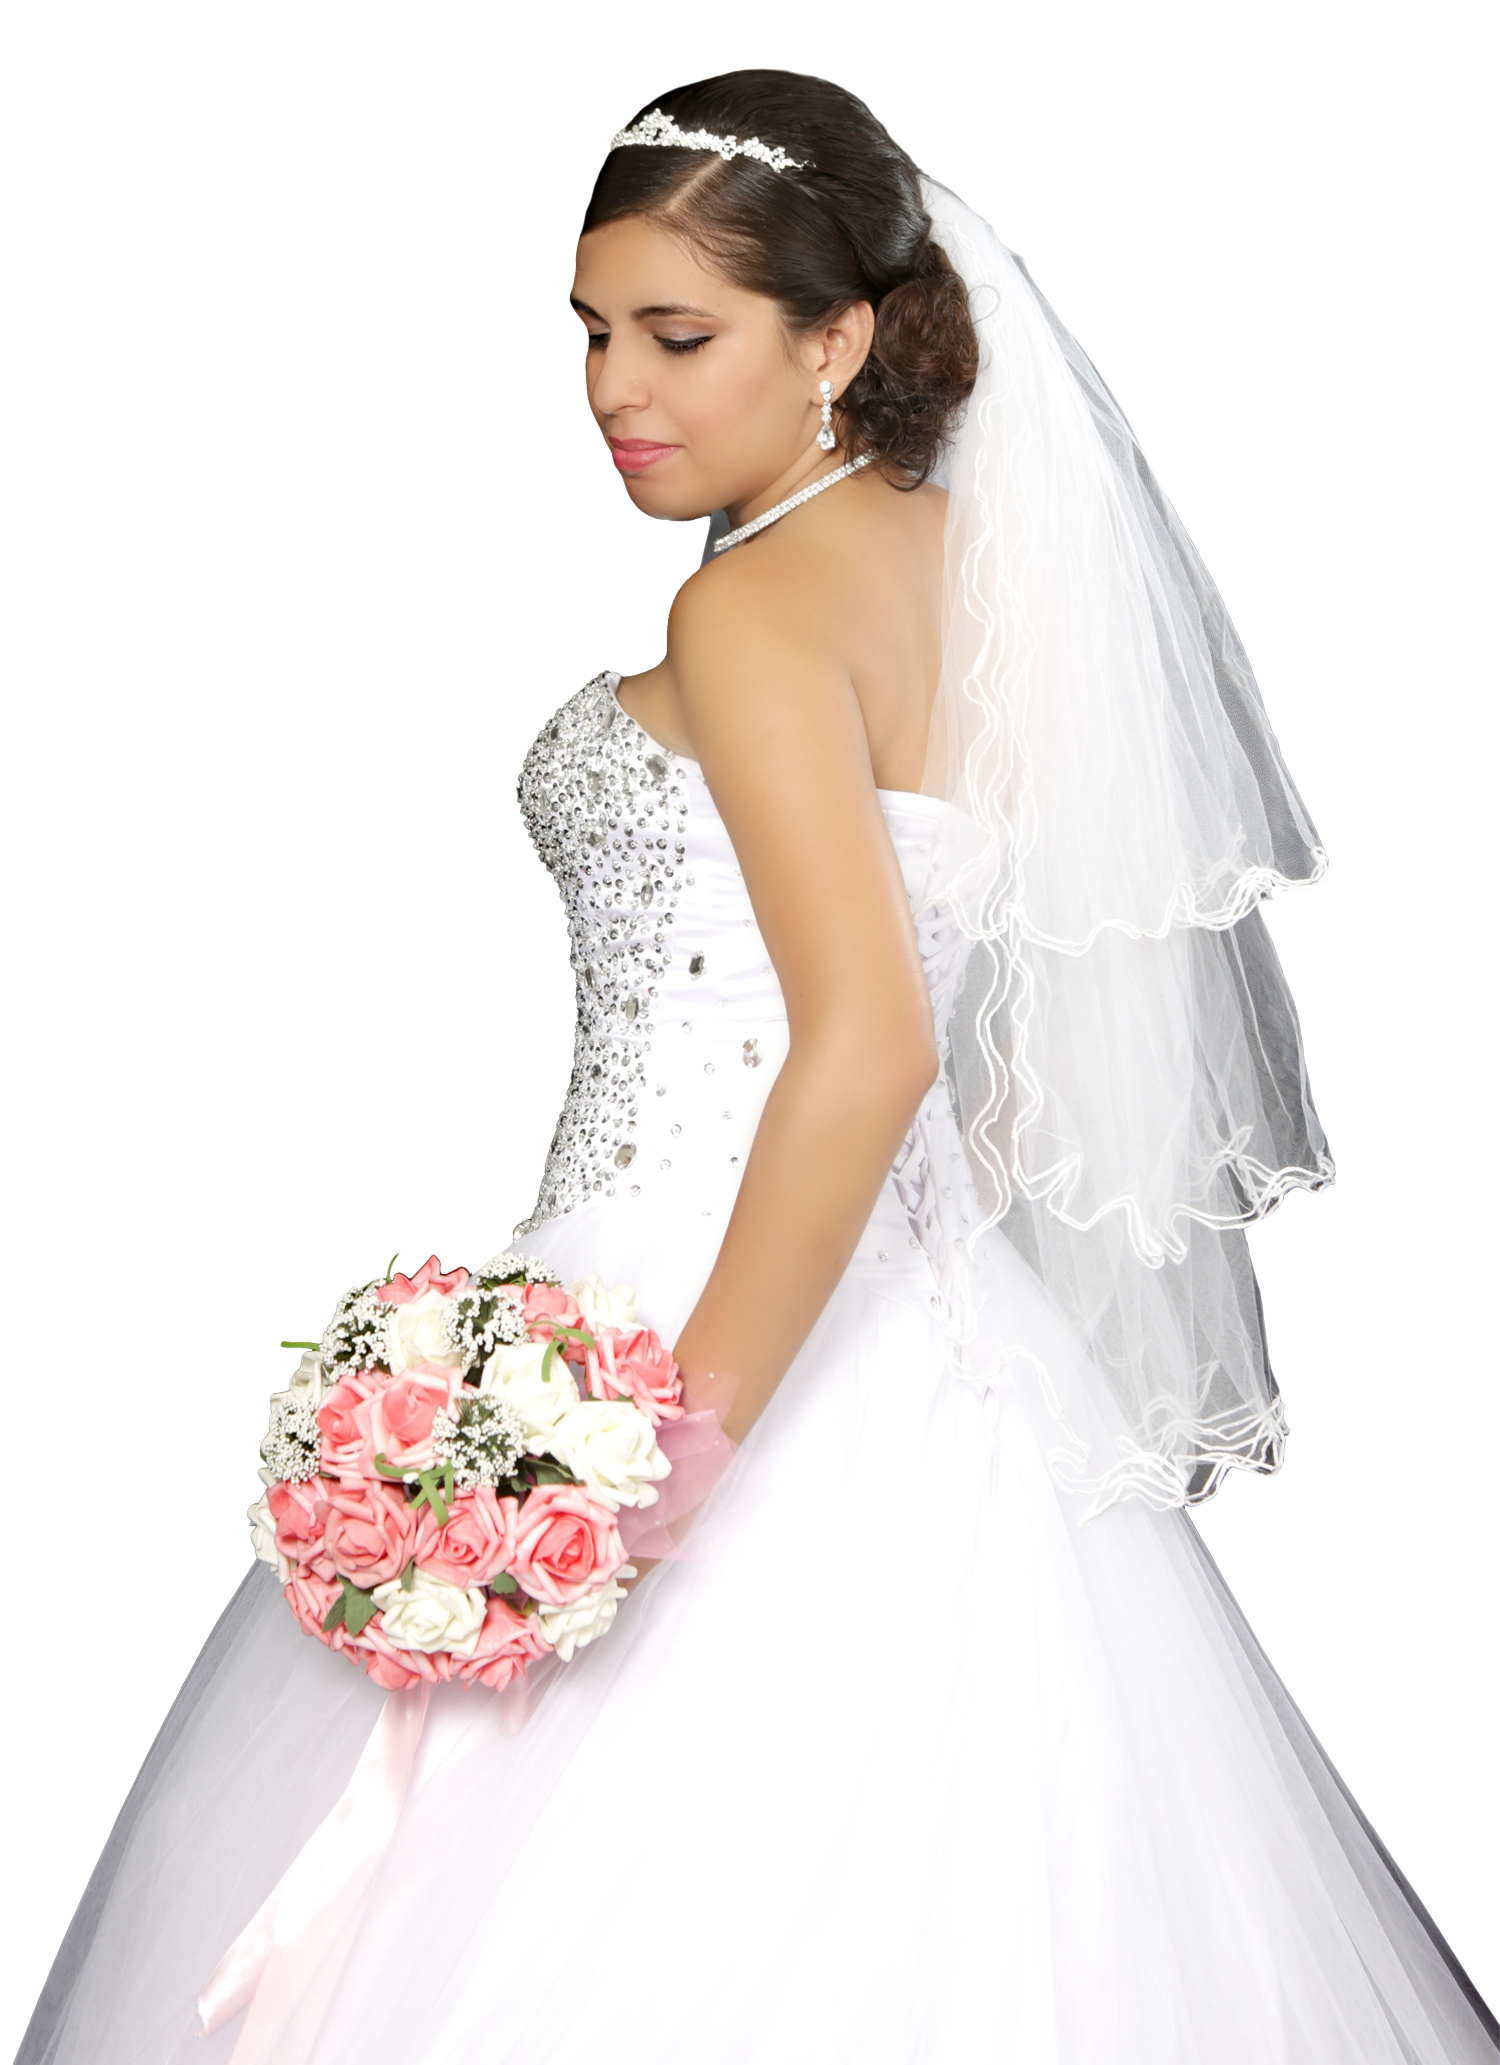 Wedding Girl PNG Transparent Image - Girl PNG